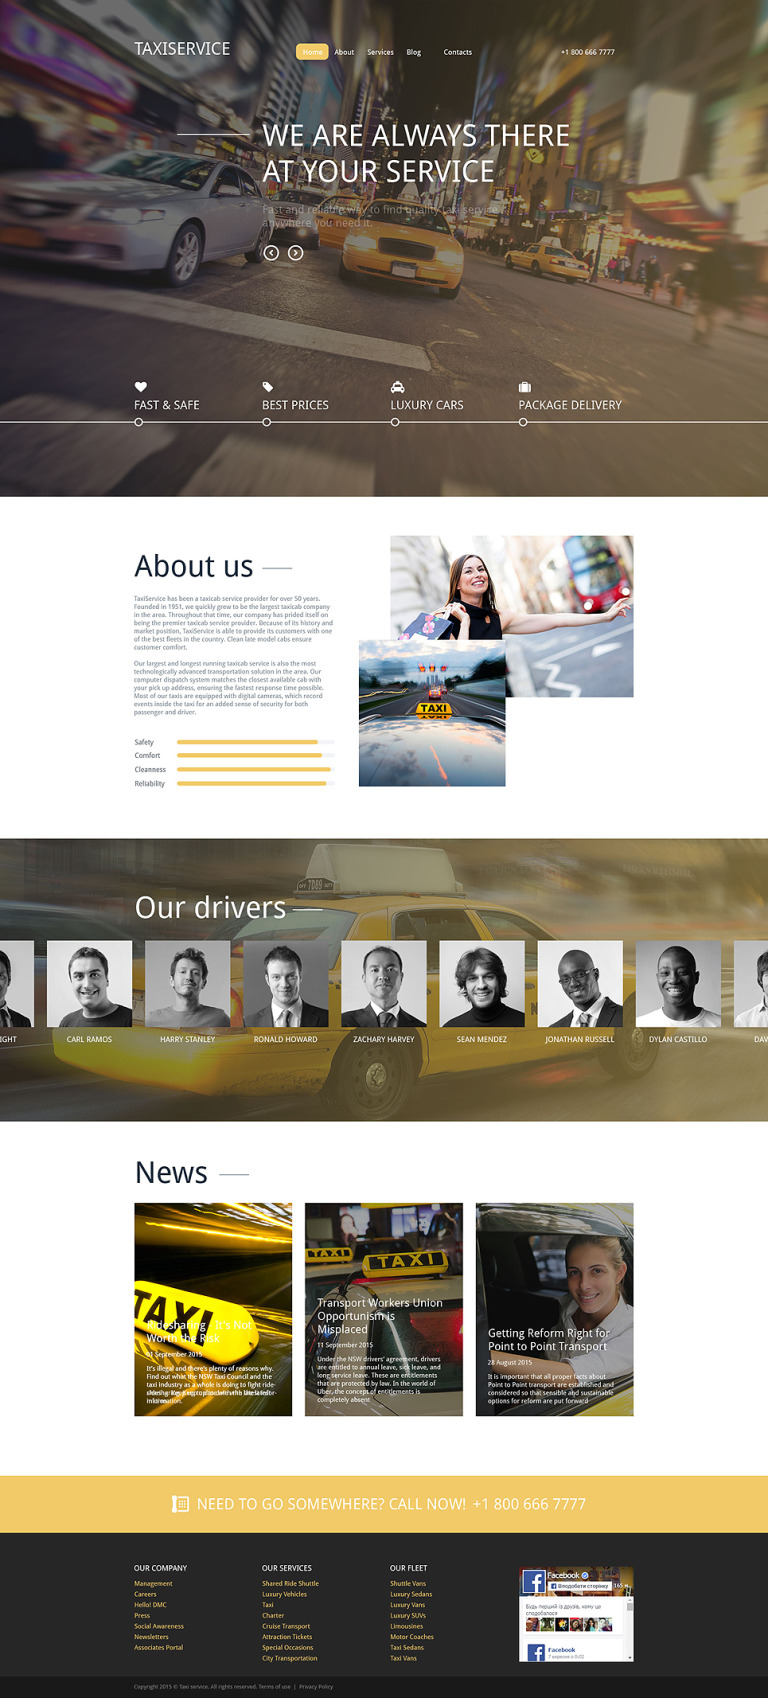 Taxiservice Drupal Template New Screenshots BIG